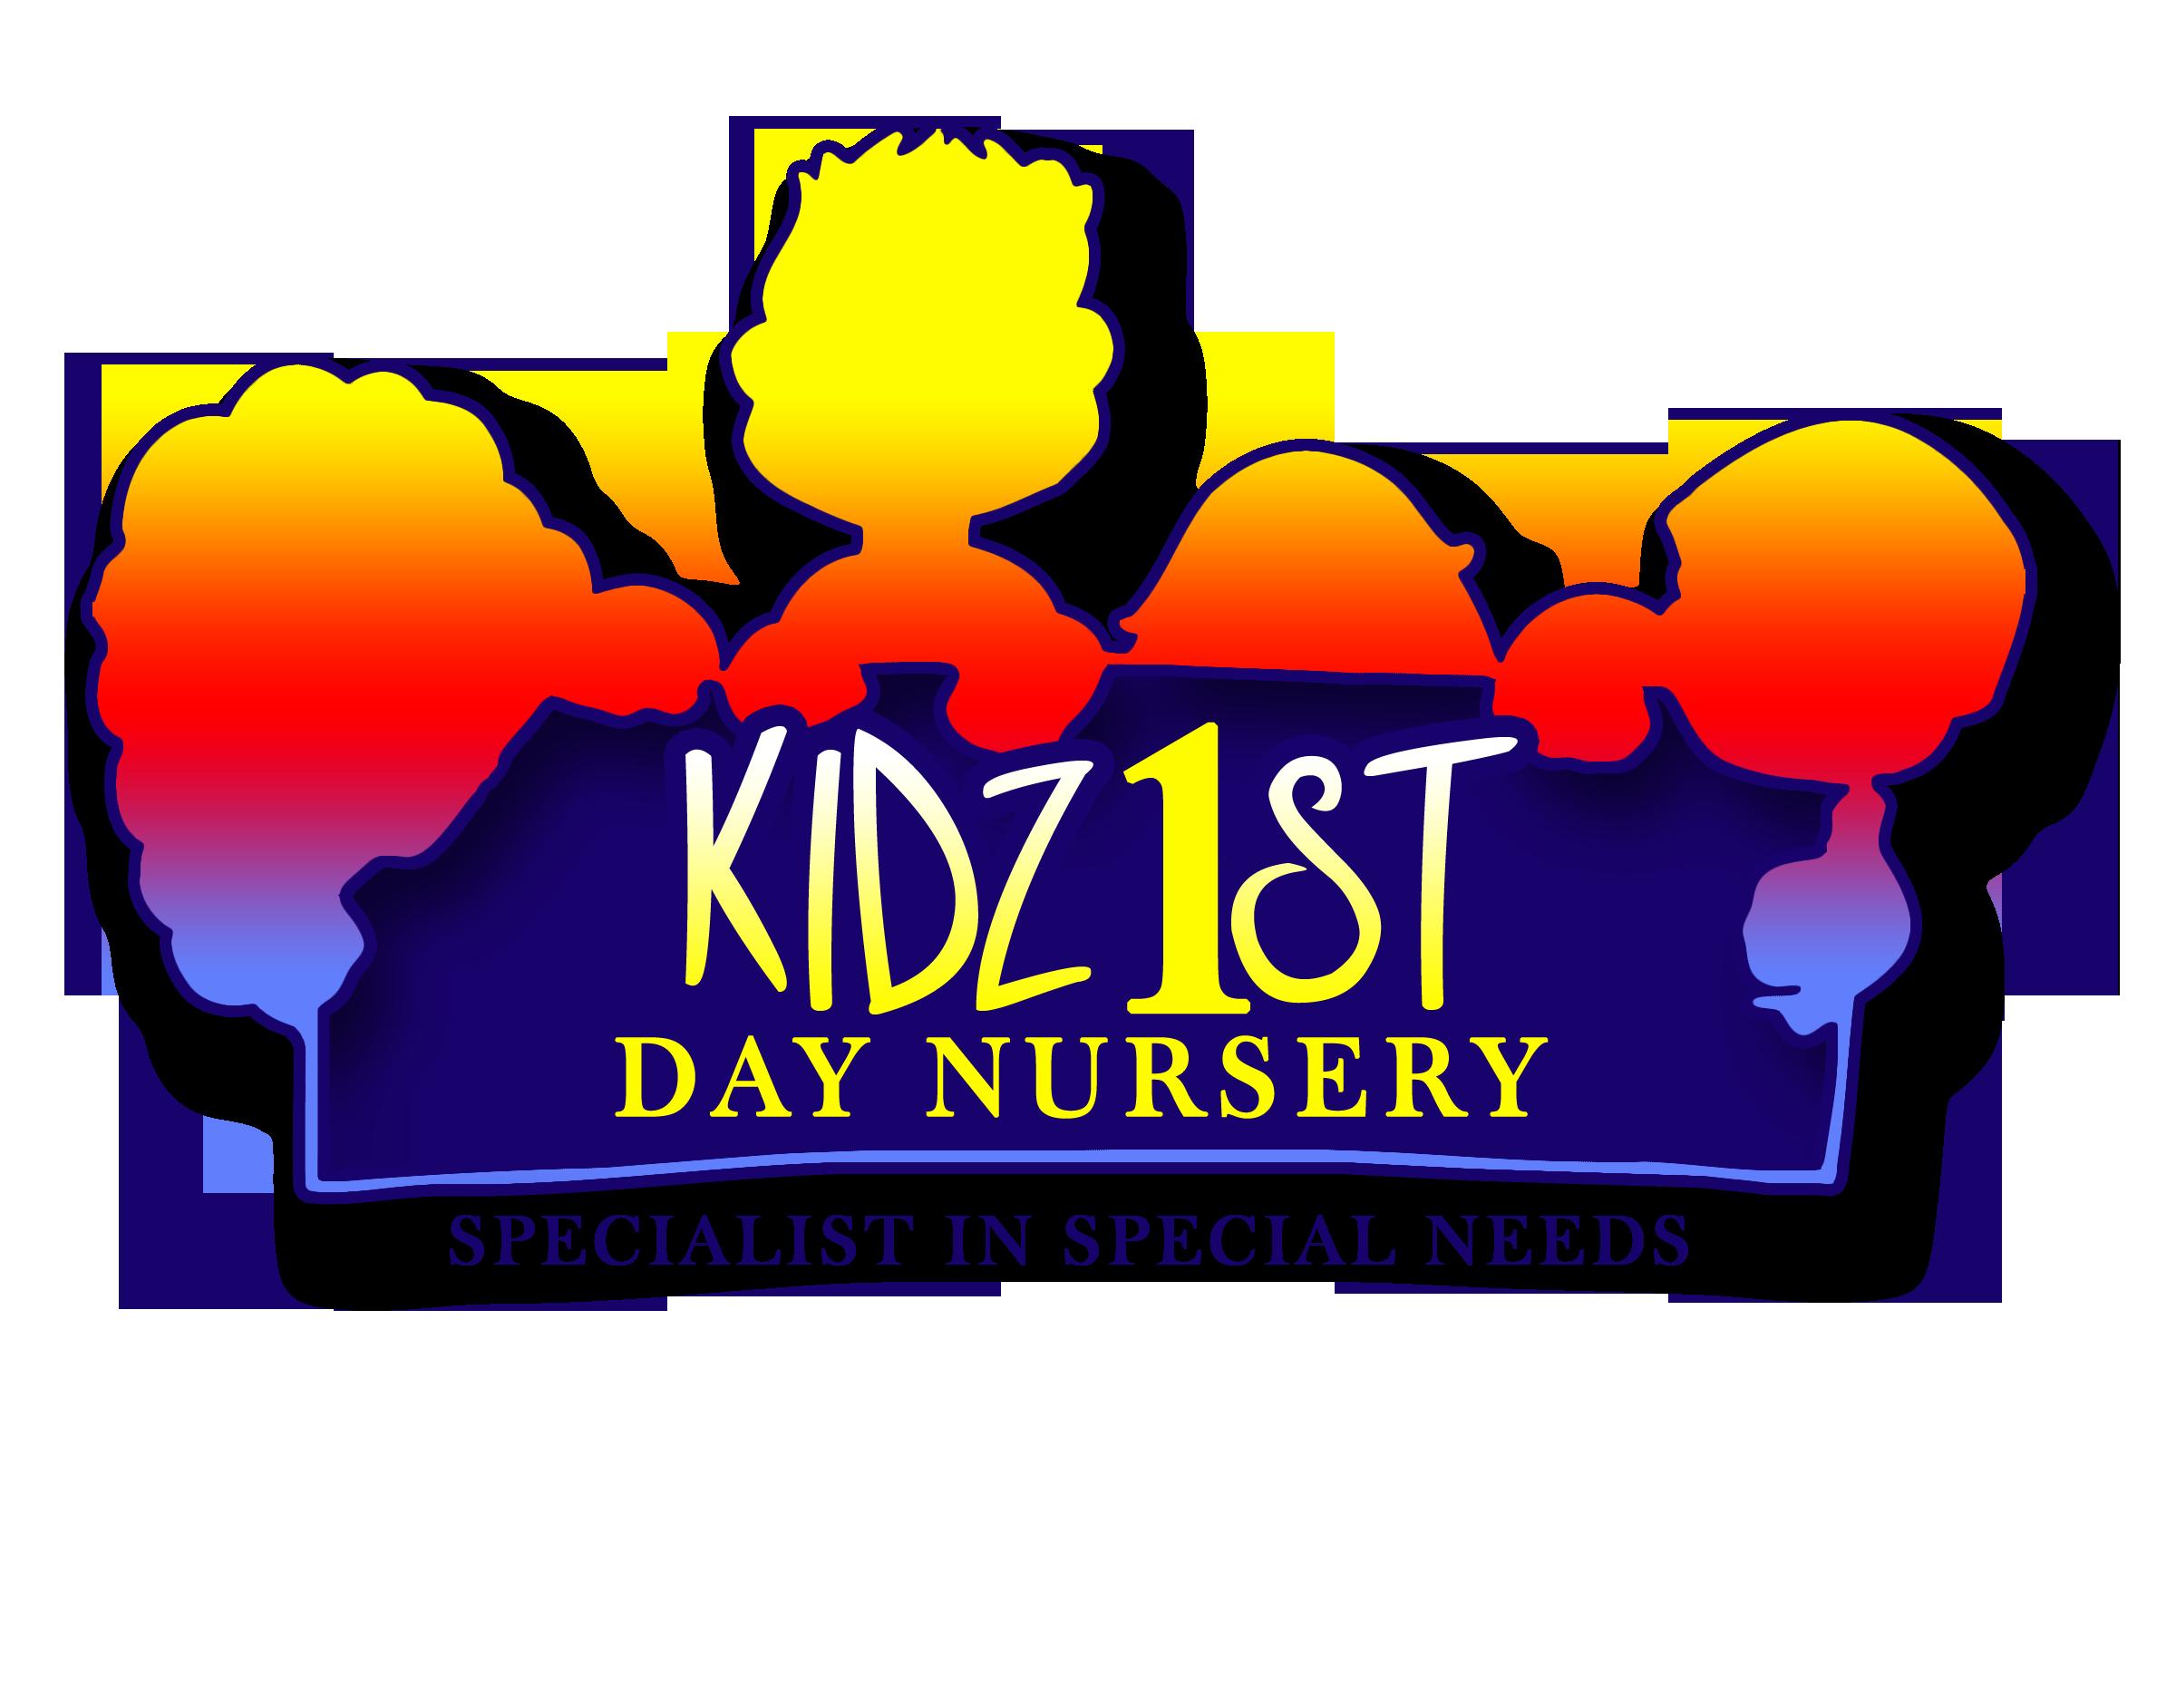 Kidz 1st Day Nursery - London, London NW10 8UN - 020 8965 9585 | ShowMeLocal.com